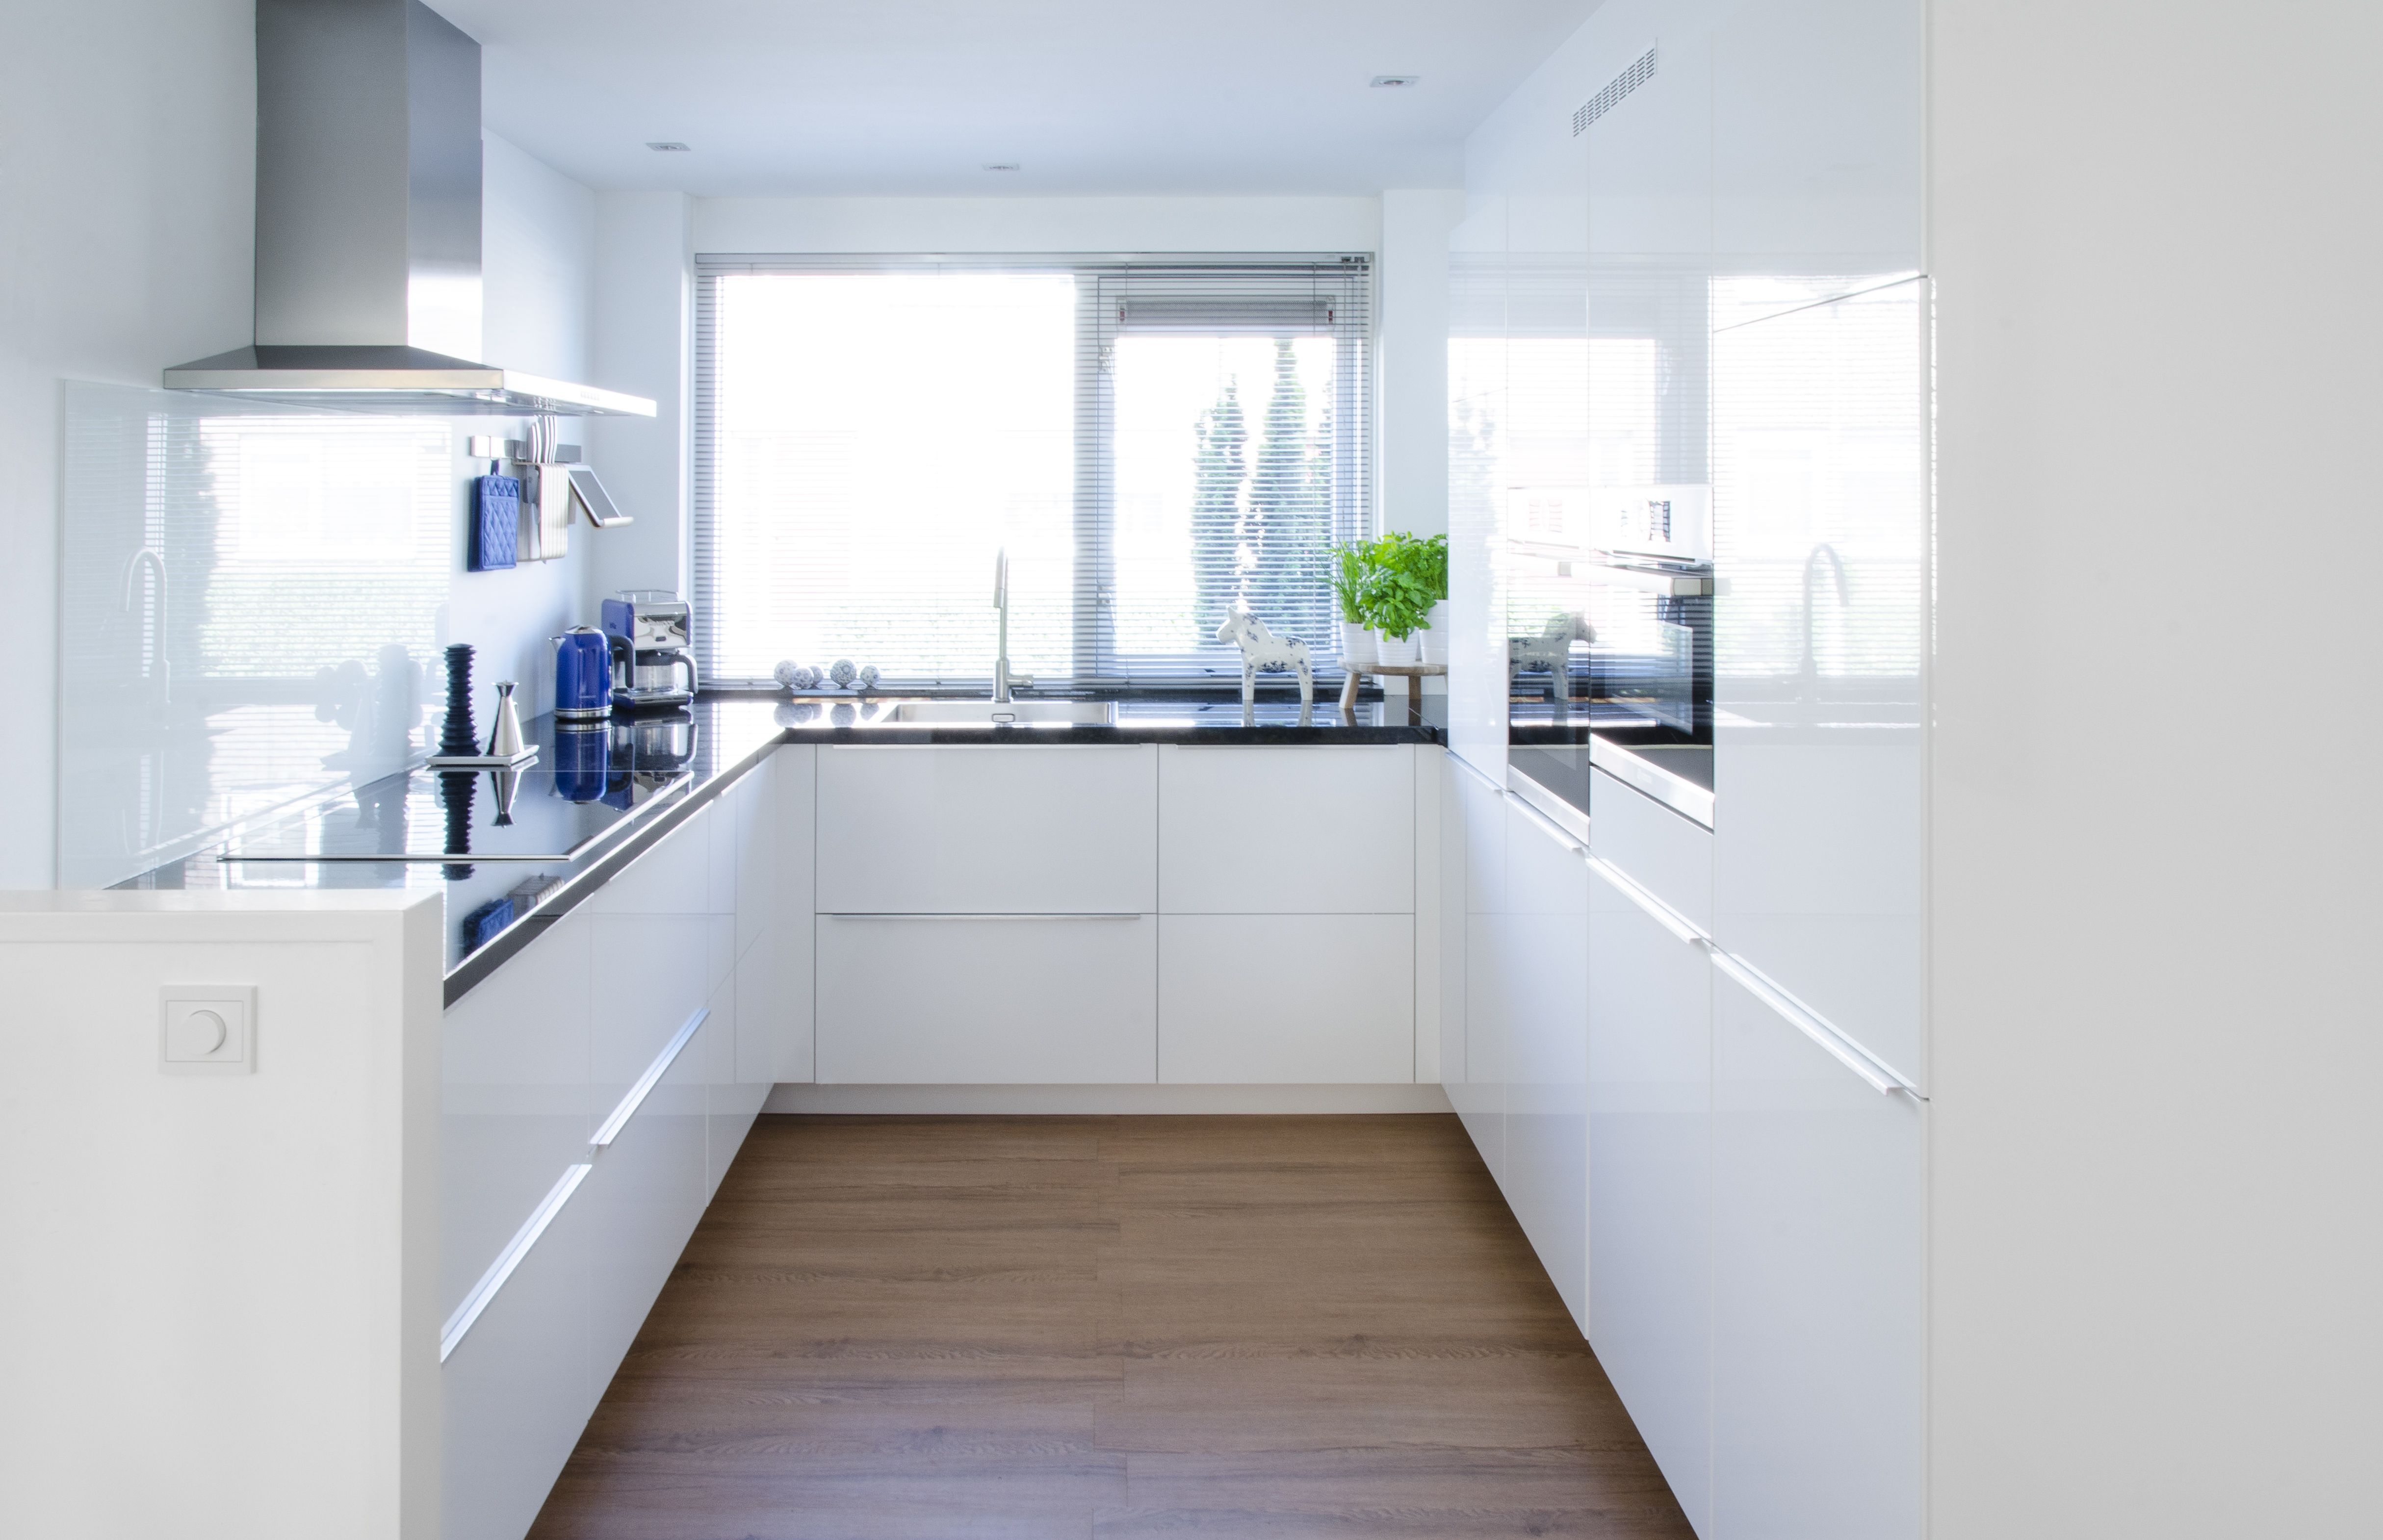 Metod Keuken Ikea : Anki ikea designer studio by ikea ikea